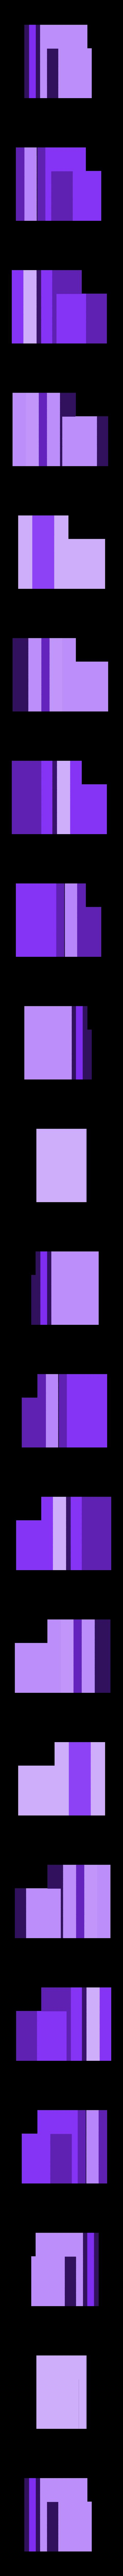 Switch.stl Download free STL file Single Pin Switch • 3D print object, PentlandDesigns